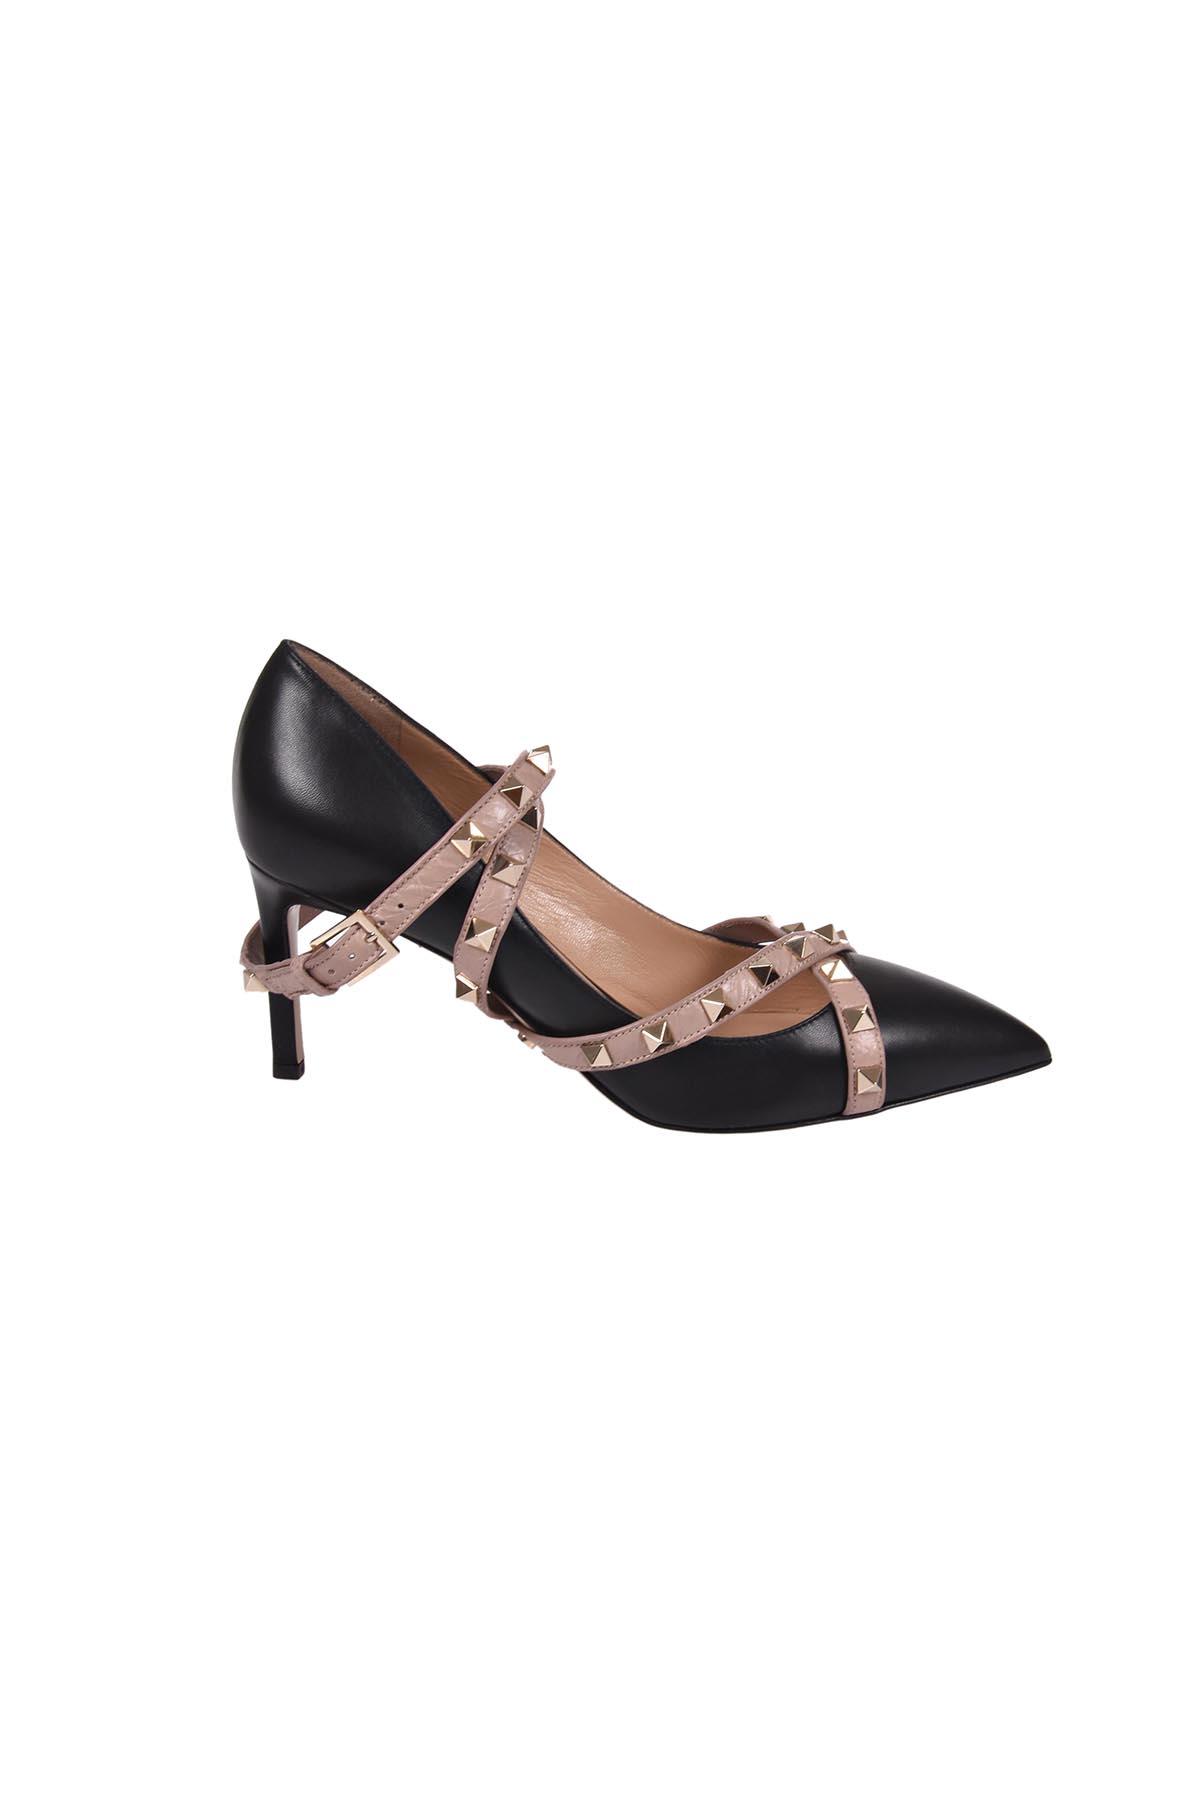 Valentino Garavani Ankle Strap 75 Shoes